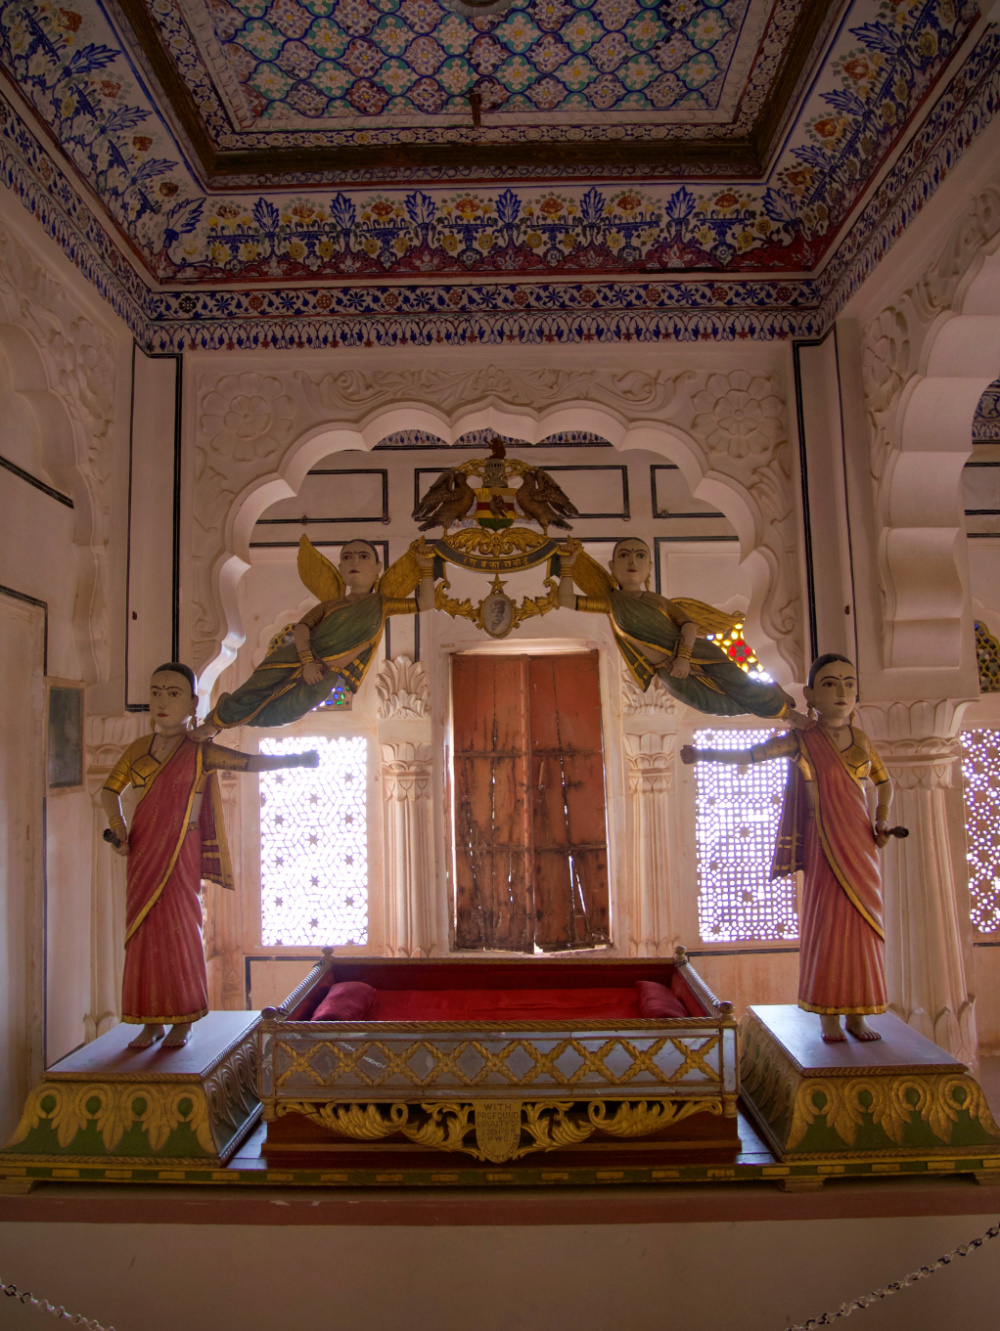 618-India-Jodhpur